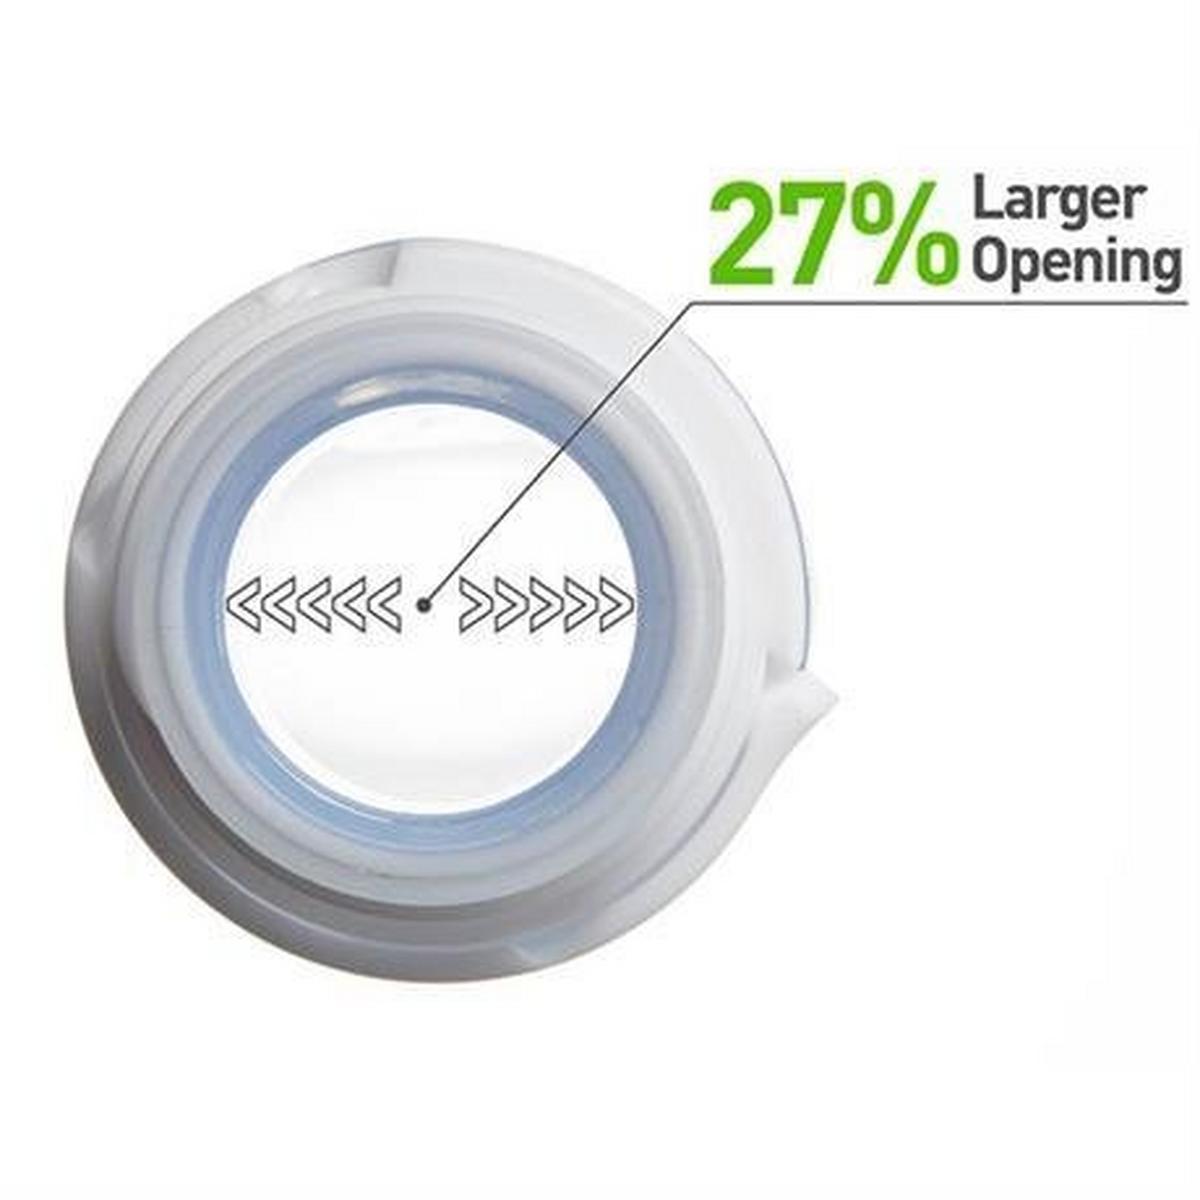 Humangear GoToob+ MEDIUM 74ml Clear/Green/Blue (3 Pack)